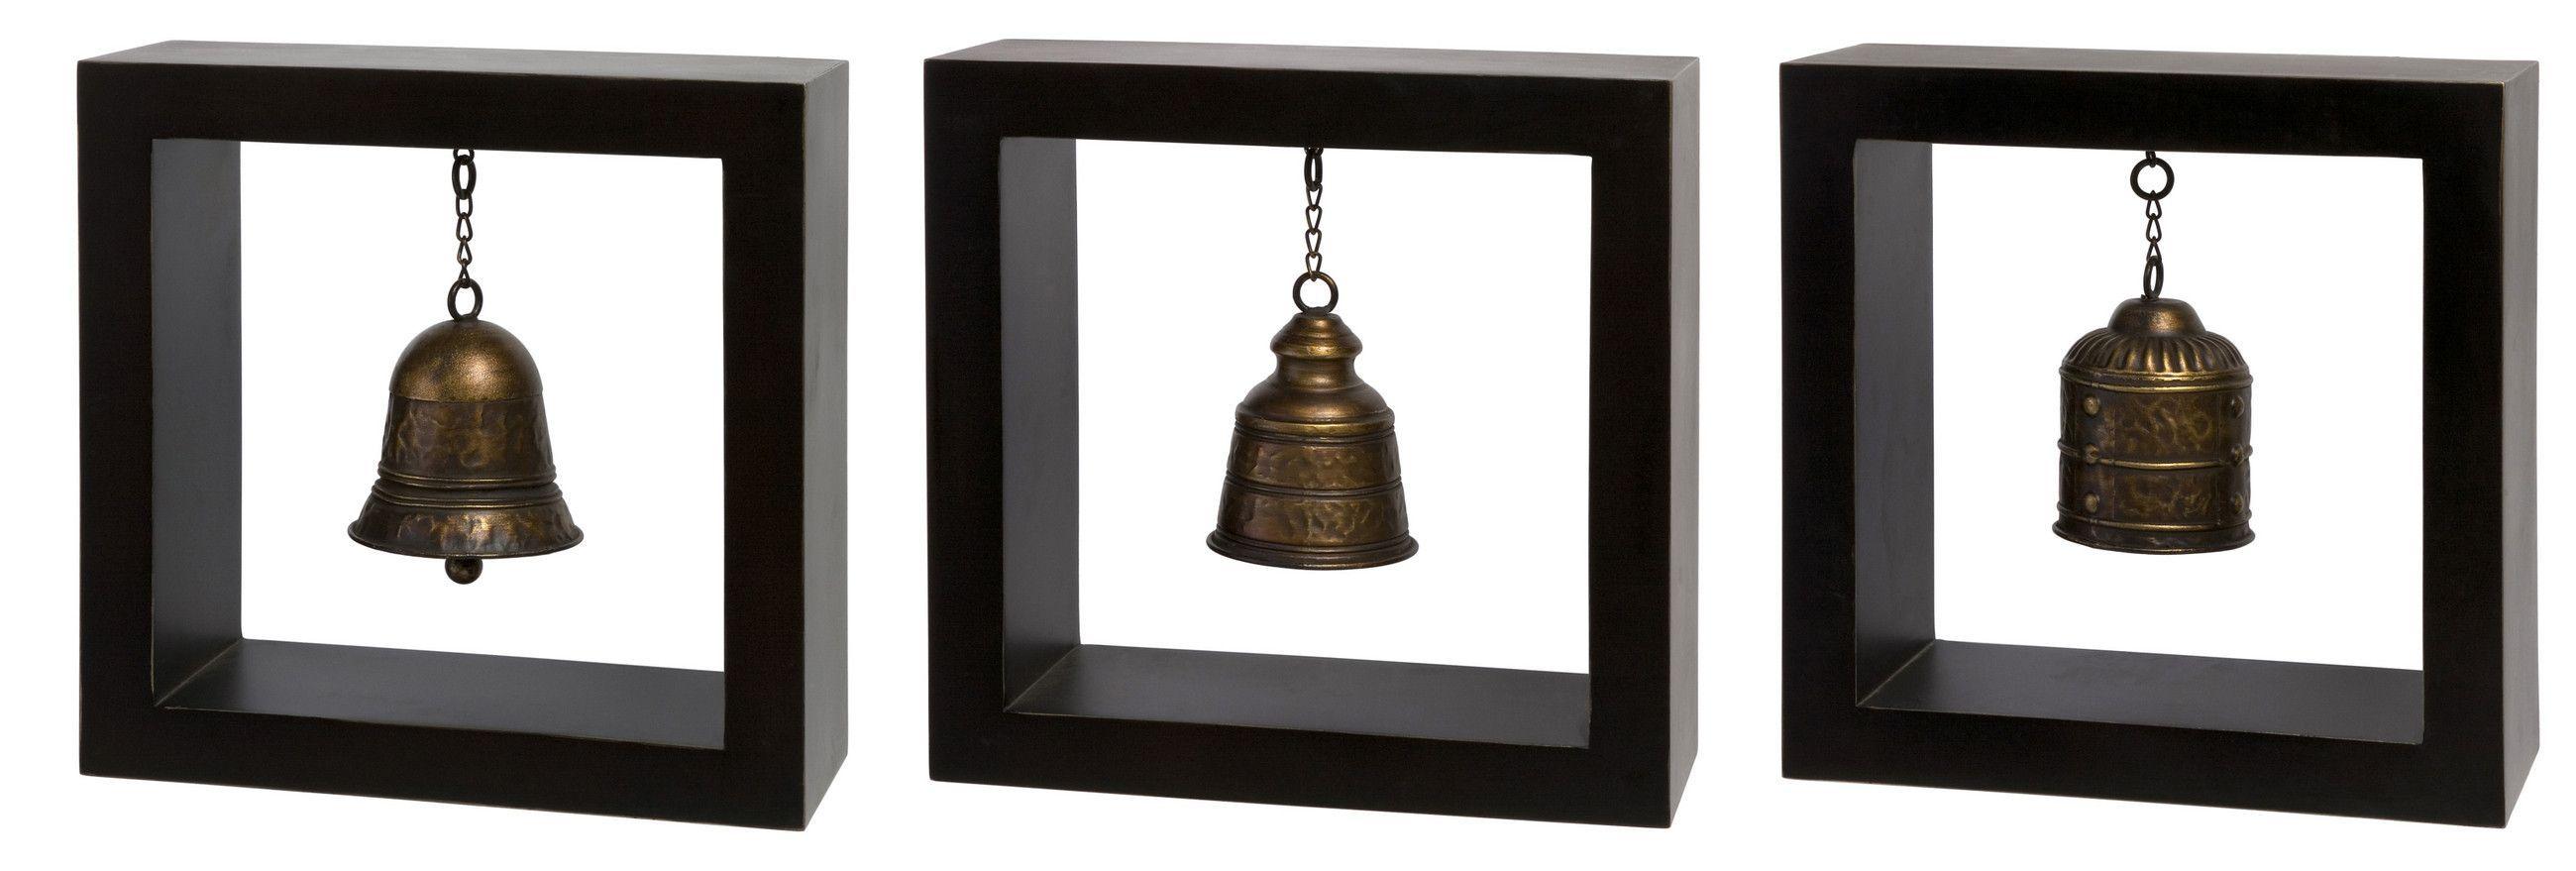 Chic framed bells set of 3 products pinterest products chic framed bells set of 3 jeuxipadfo Gallery